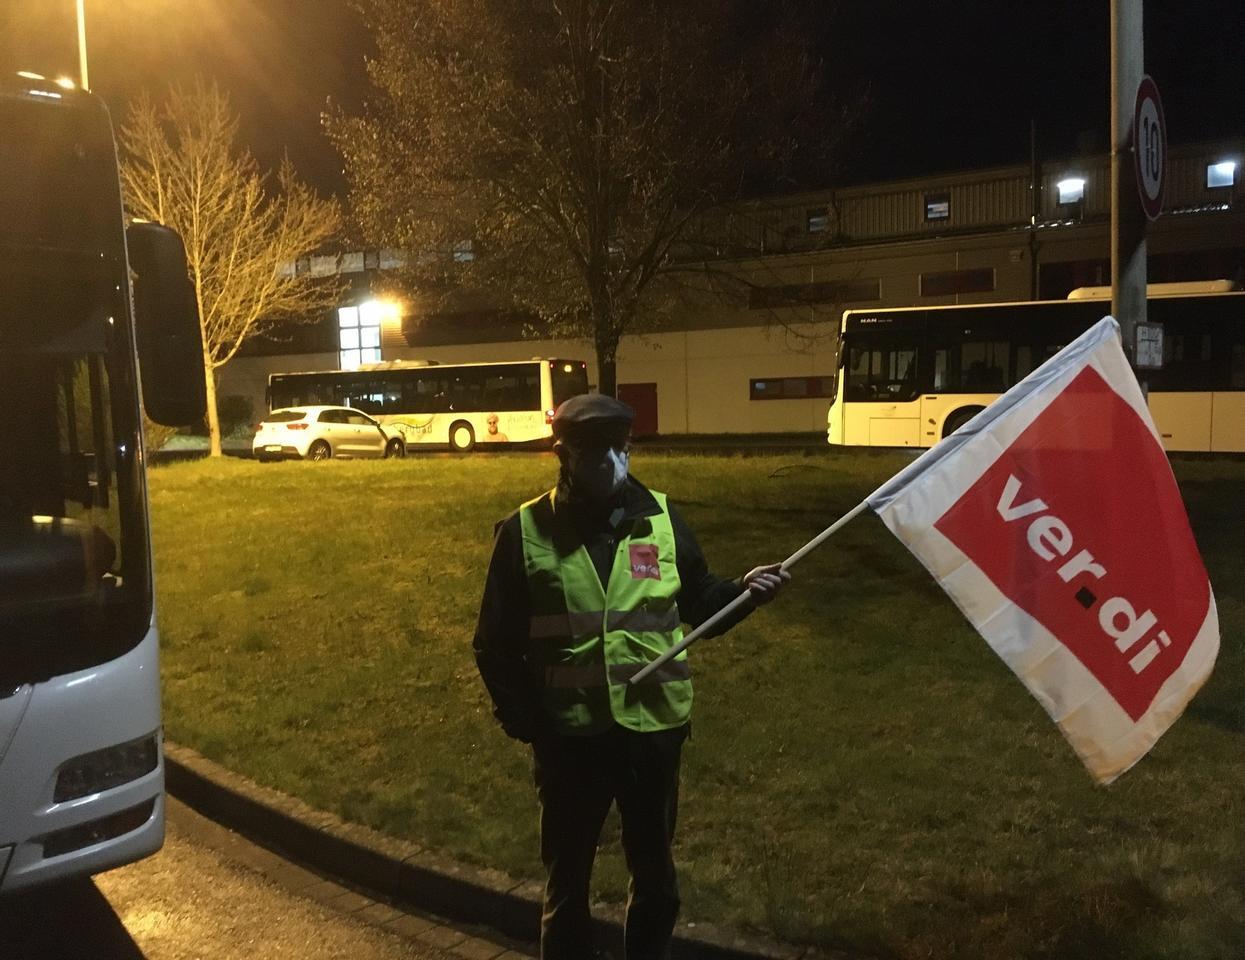 Wegen Streik: Busverkehr im Oberkreis teilweise lahmgelegt